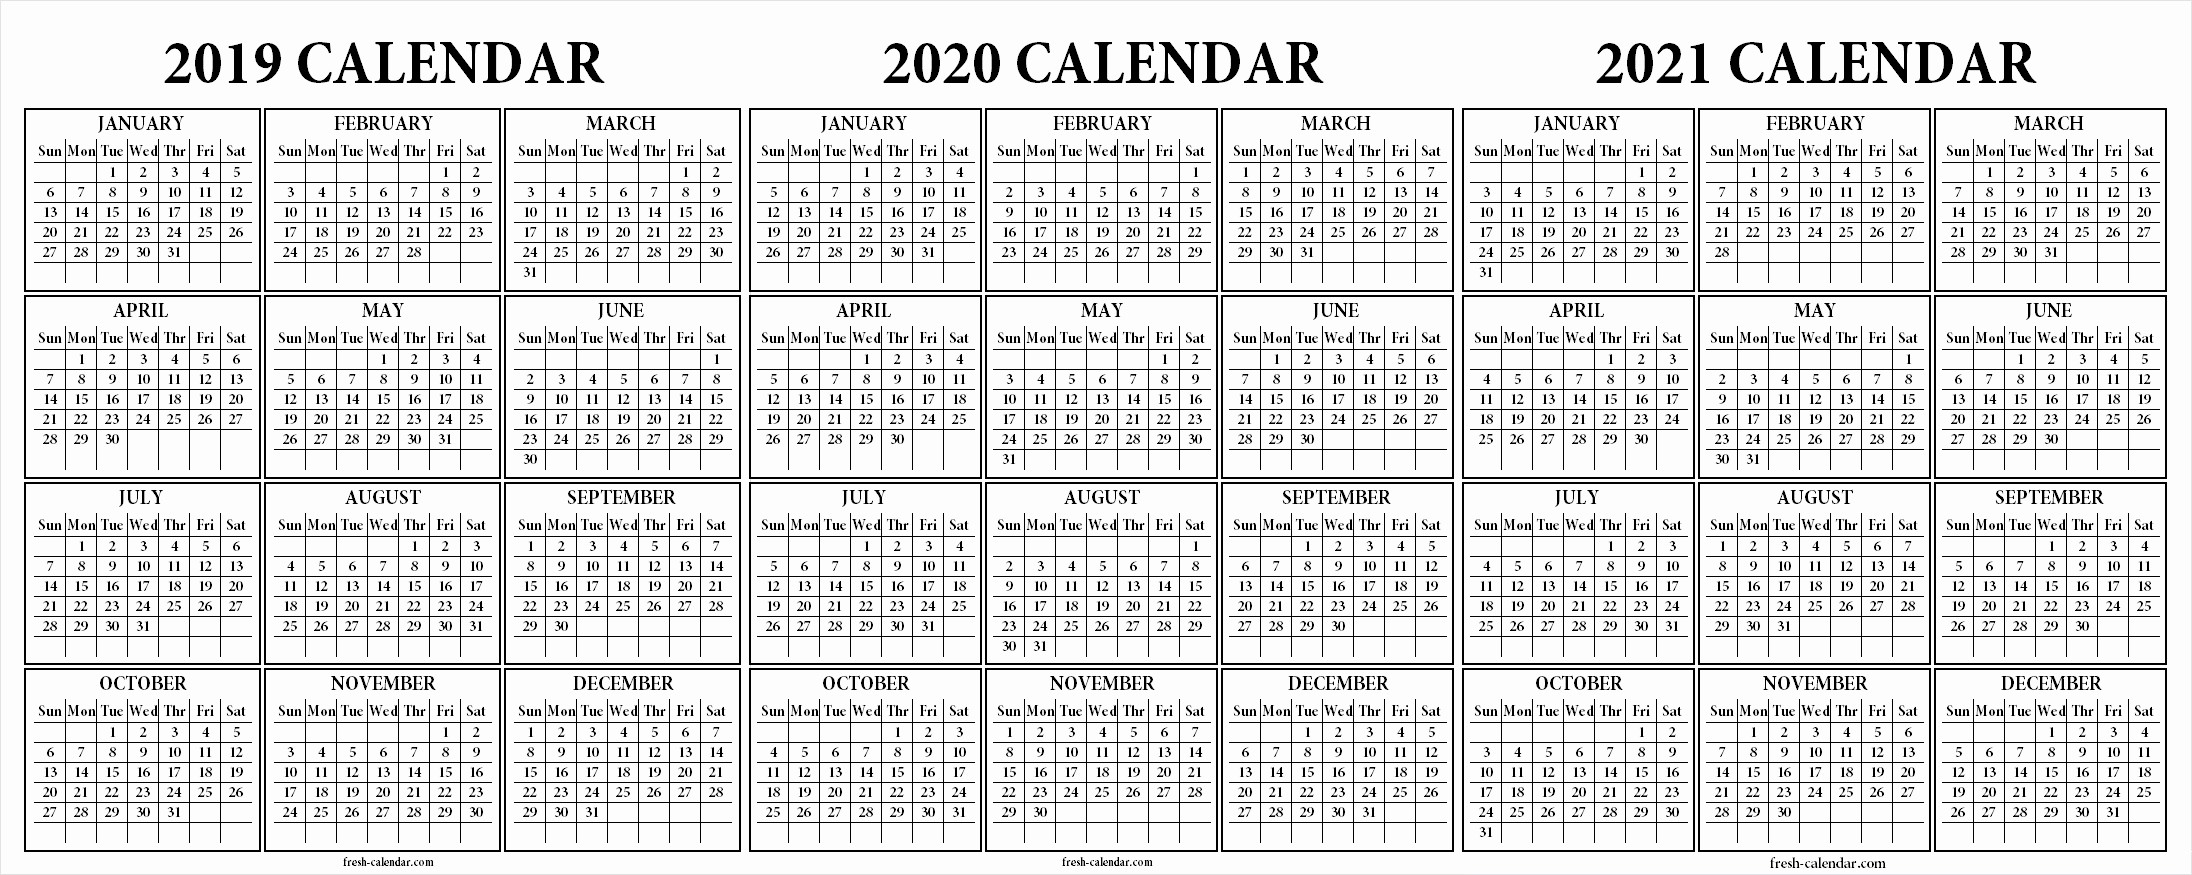 2019 and 2020 Calendar Printable Fresh Three Year Calendars for 2018 2019 2020 Uk Pdf Swifte